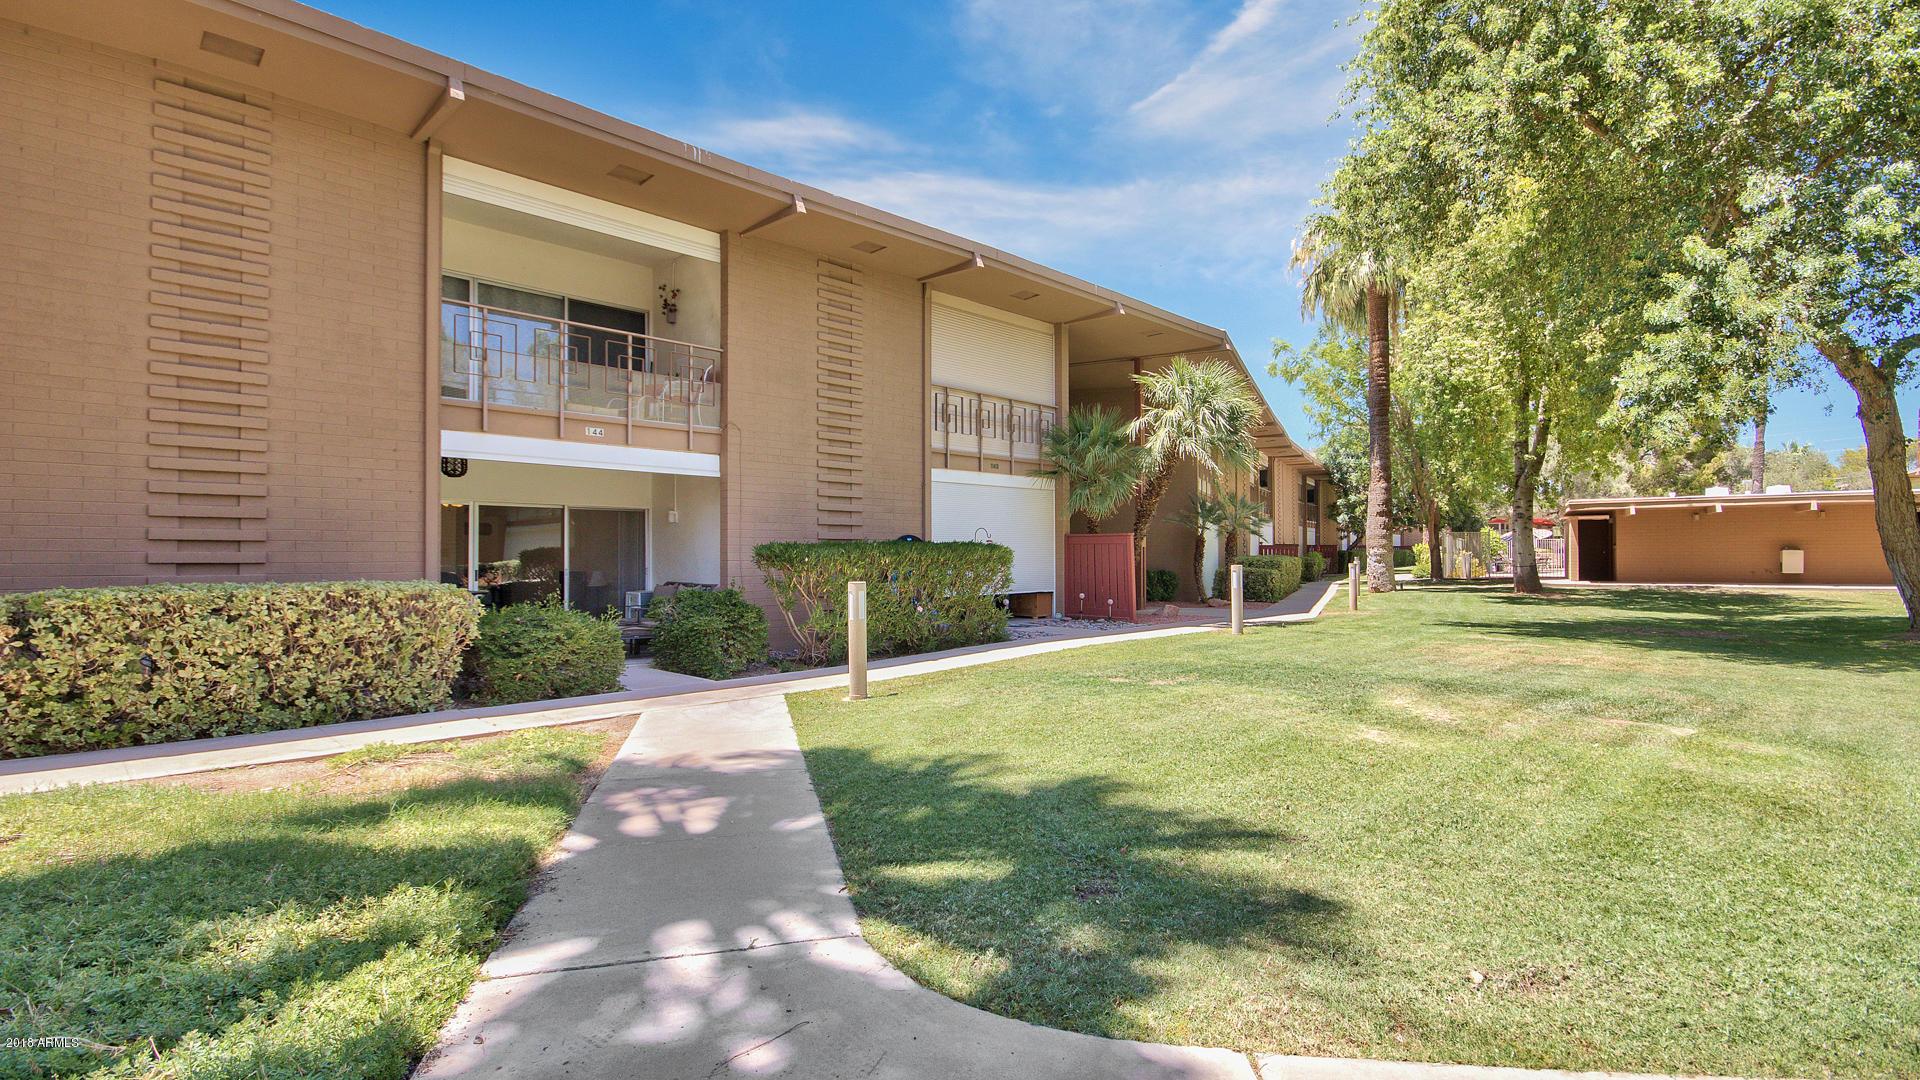 MLS 5789535 6125 E INDIAN SCHOOL Road Unit 144, Scottsdale, AZ Scottsdale AZ Condo or Townhome